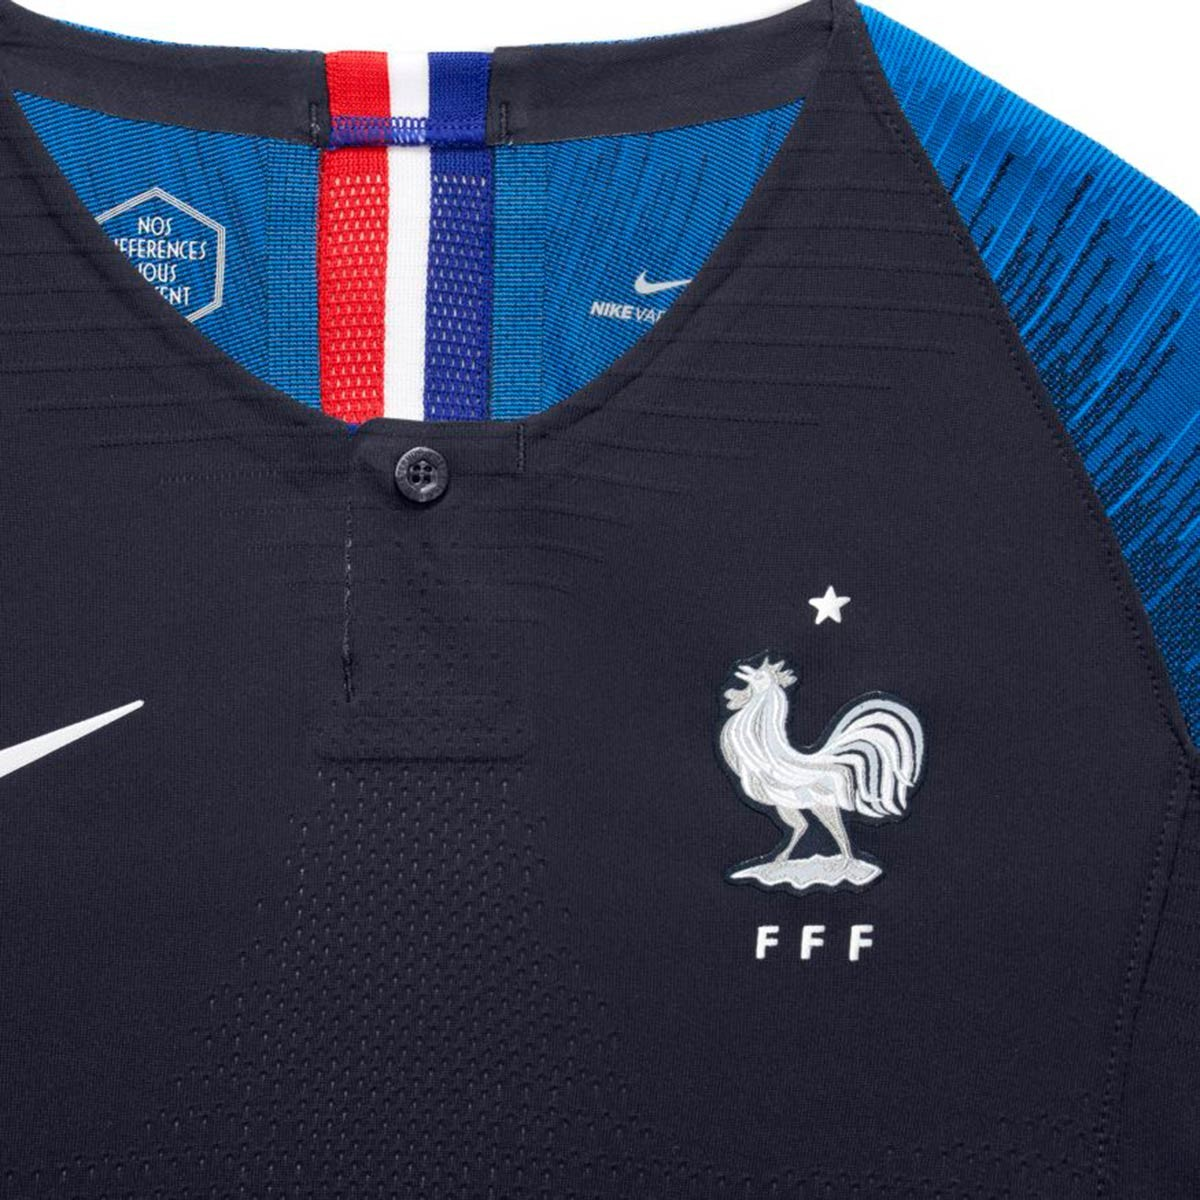 online store 3032a 0b433 Camiseta Nike Francia Vapor Primera Equipación 2018-2019 Niño  Obsidian-White - Soloporteros es ahora Fútbol Emotion